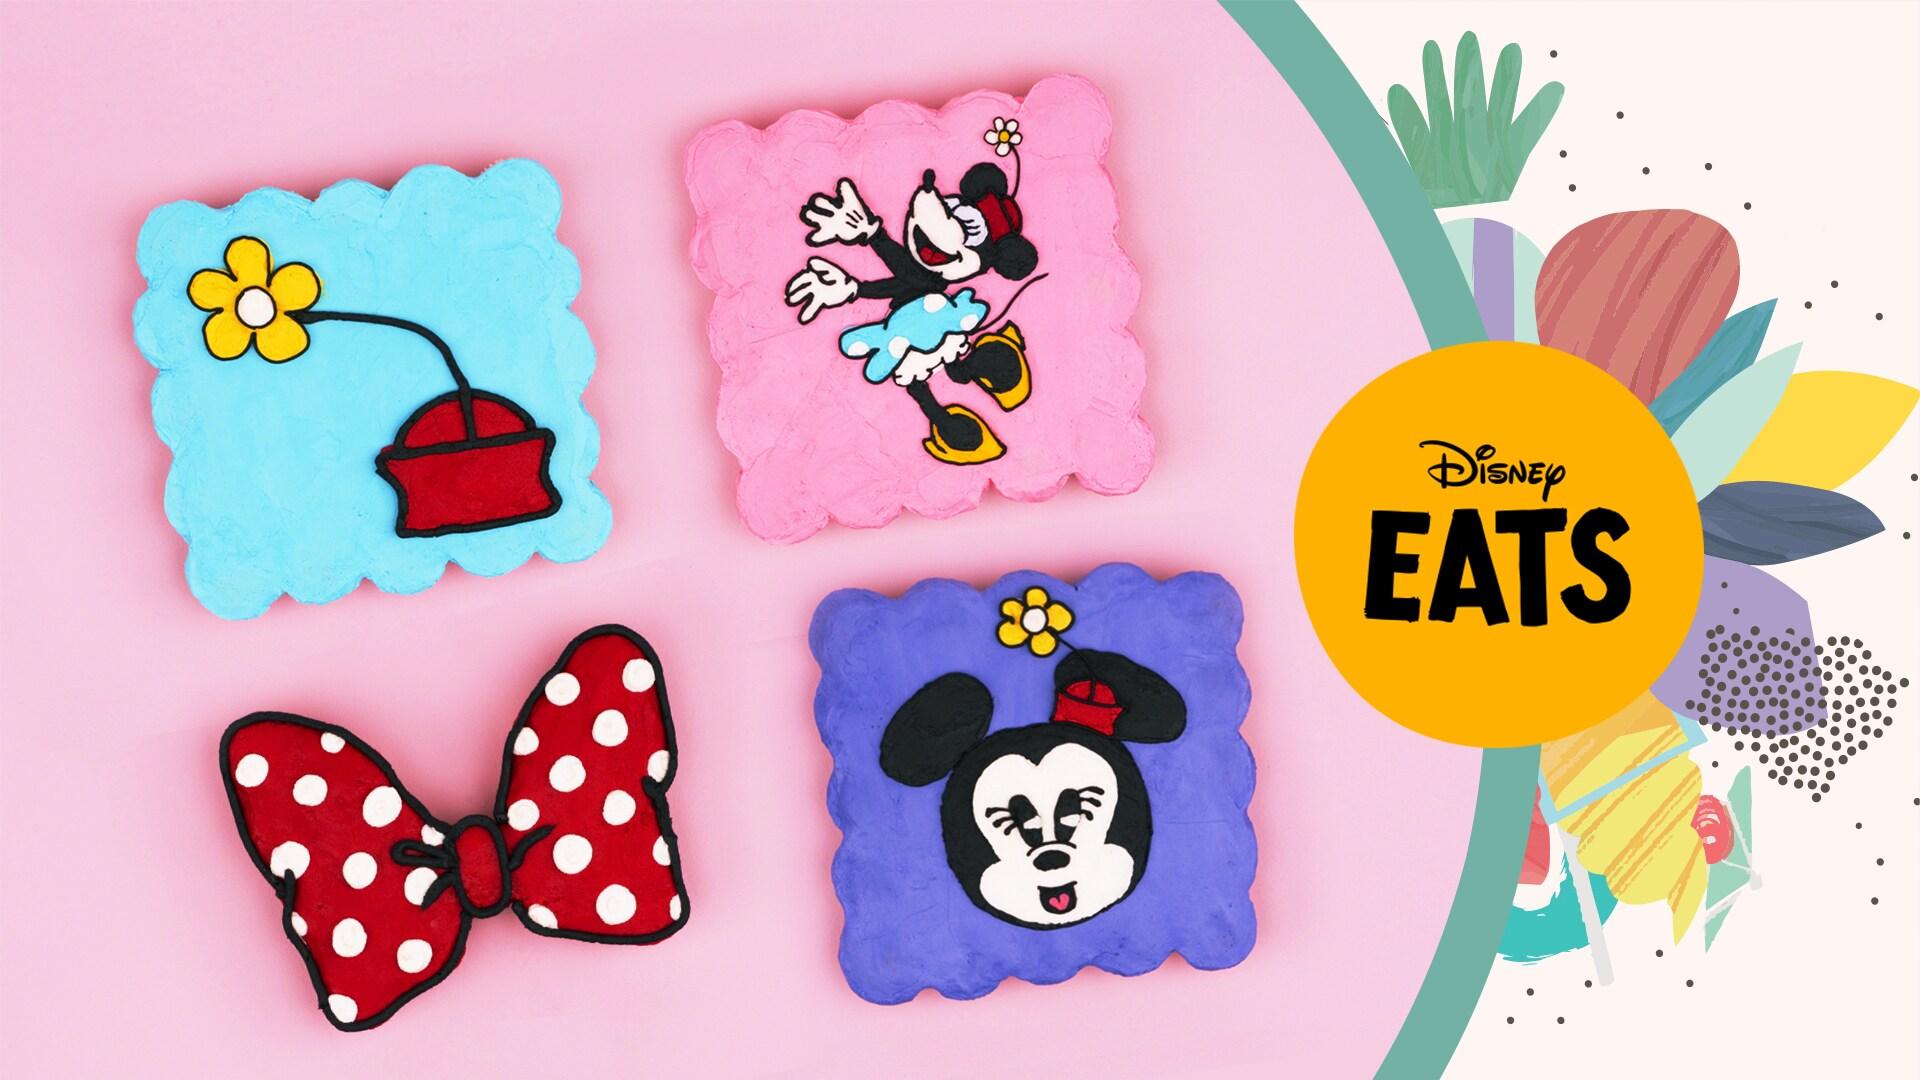 Minnie Mouse Cupcake Cakes | Disney Eats